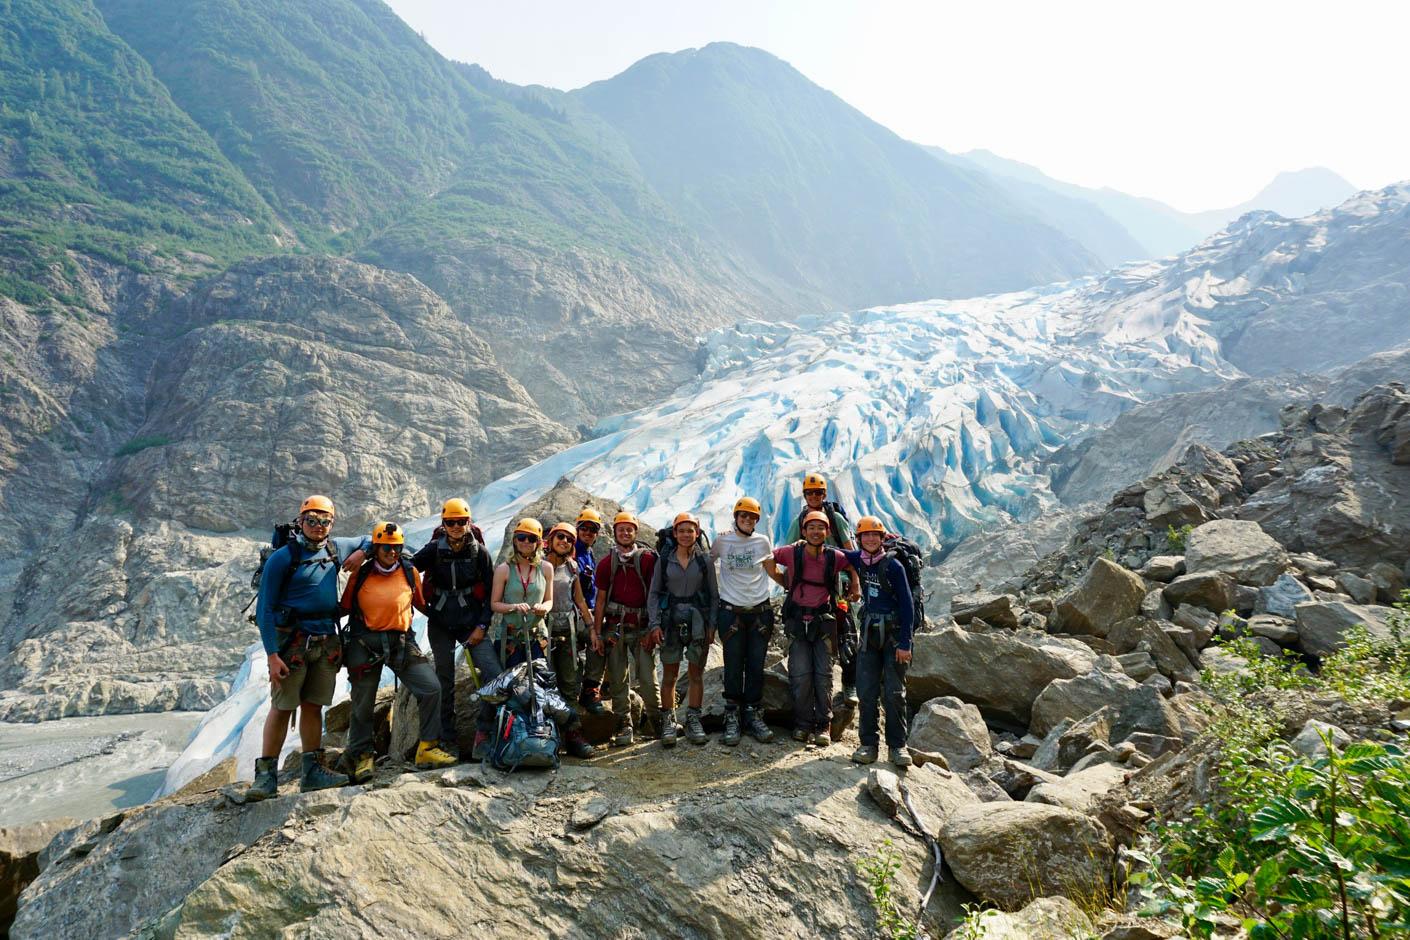 Alaska Southeast ice climbing